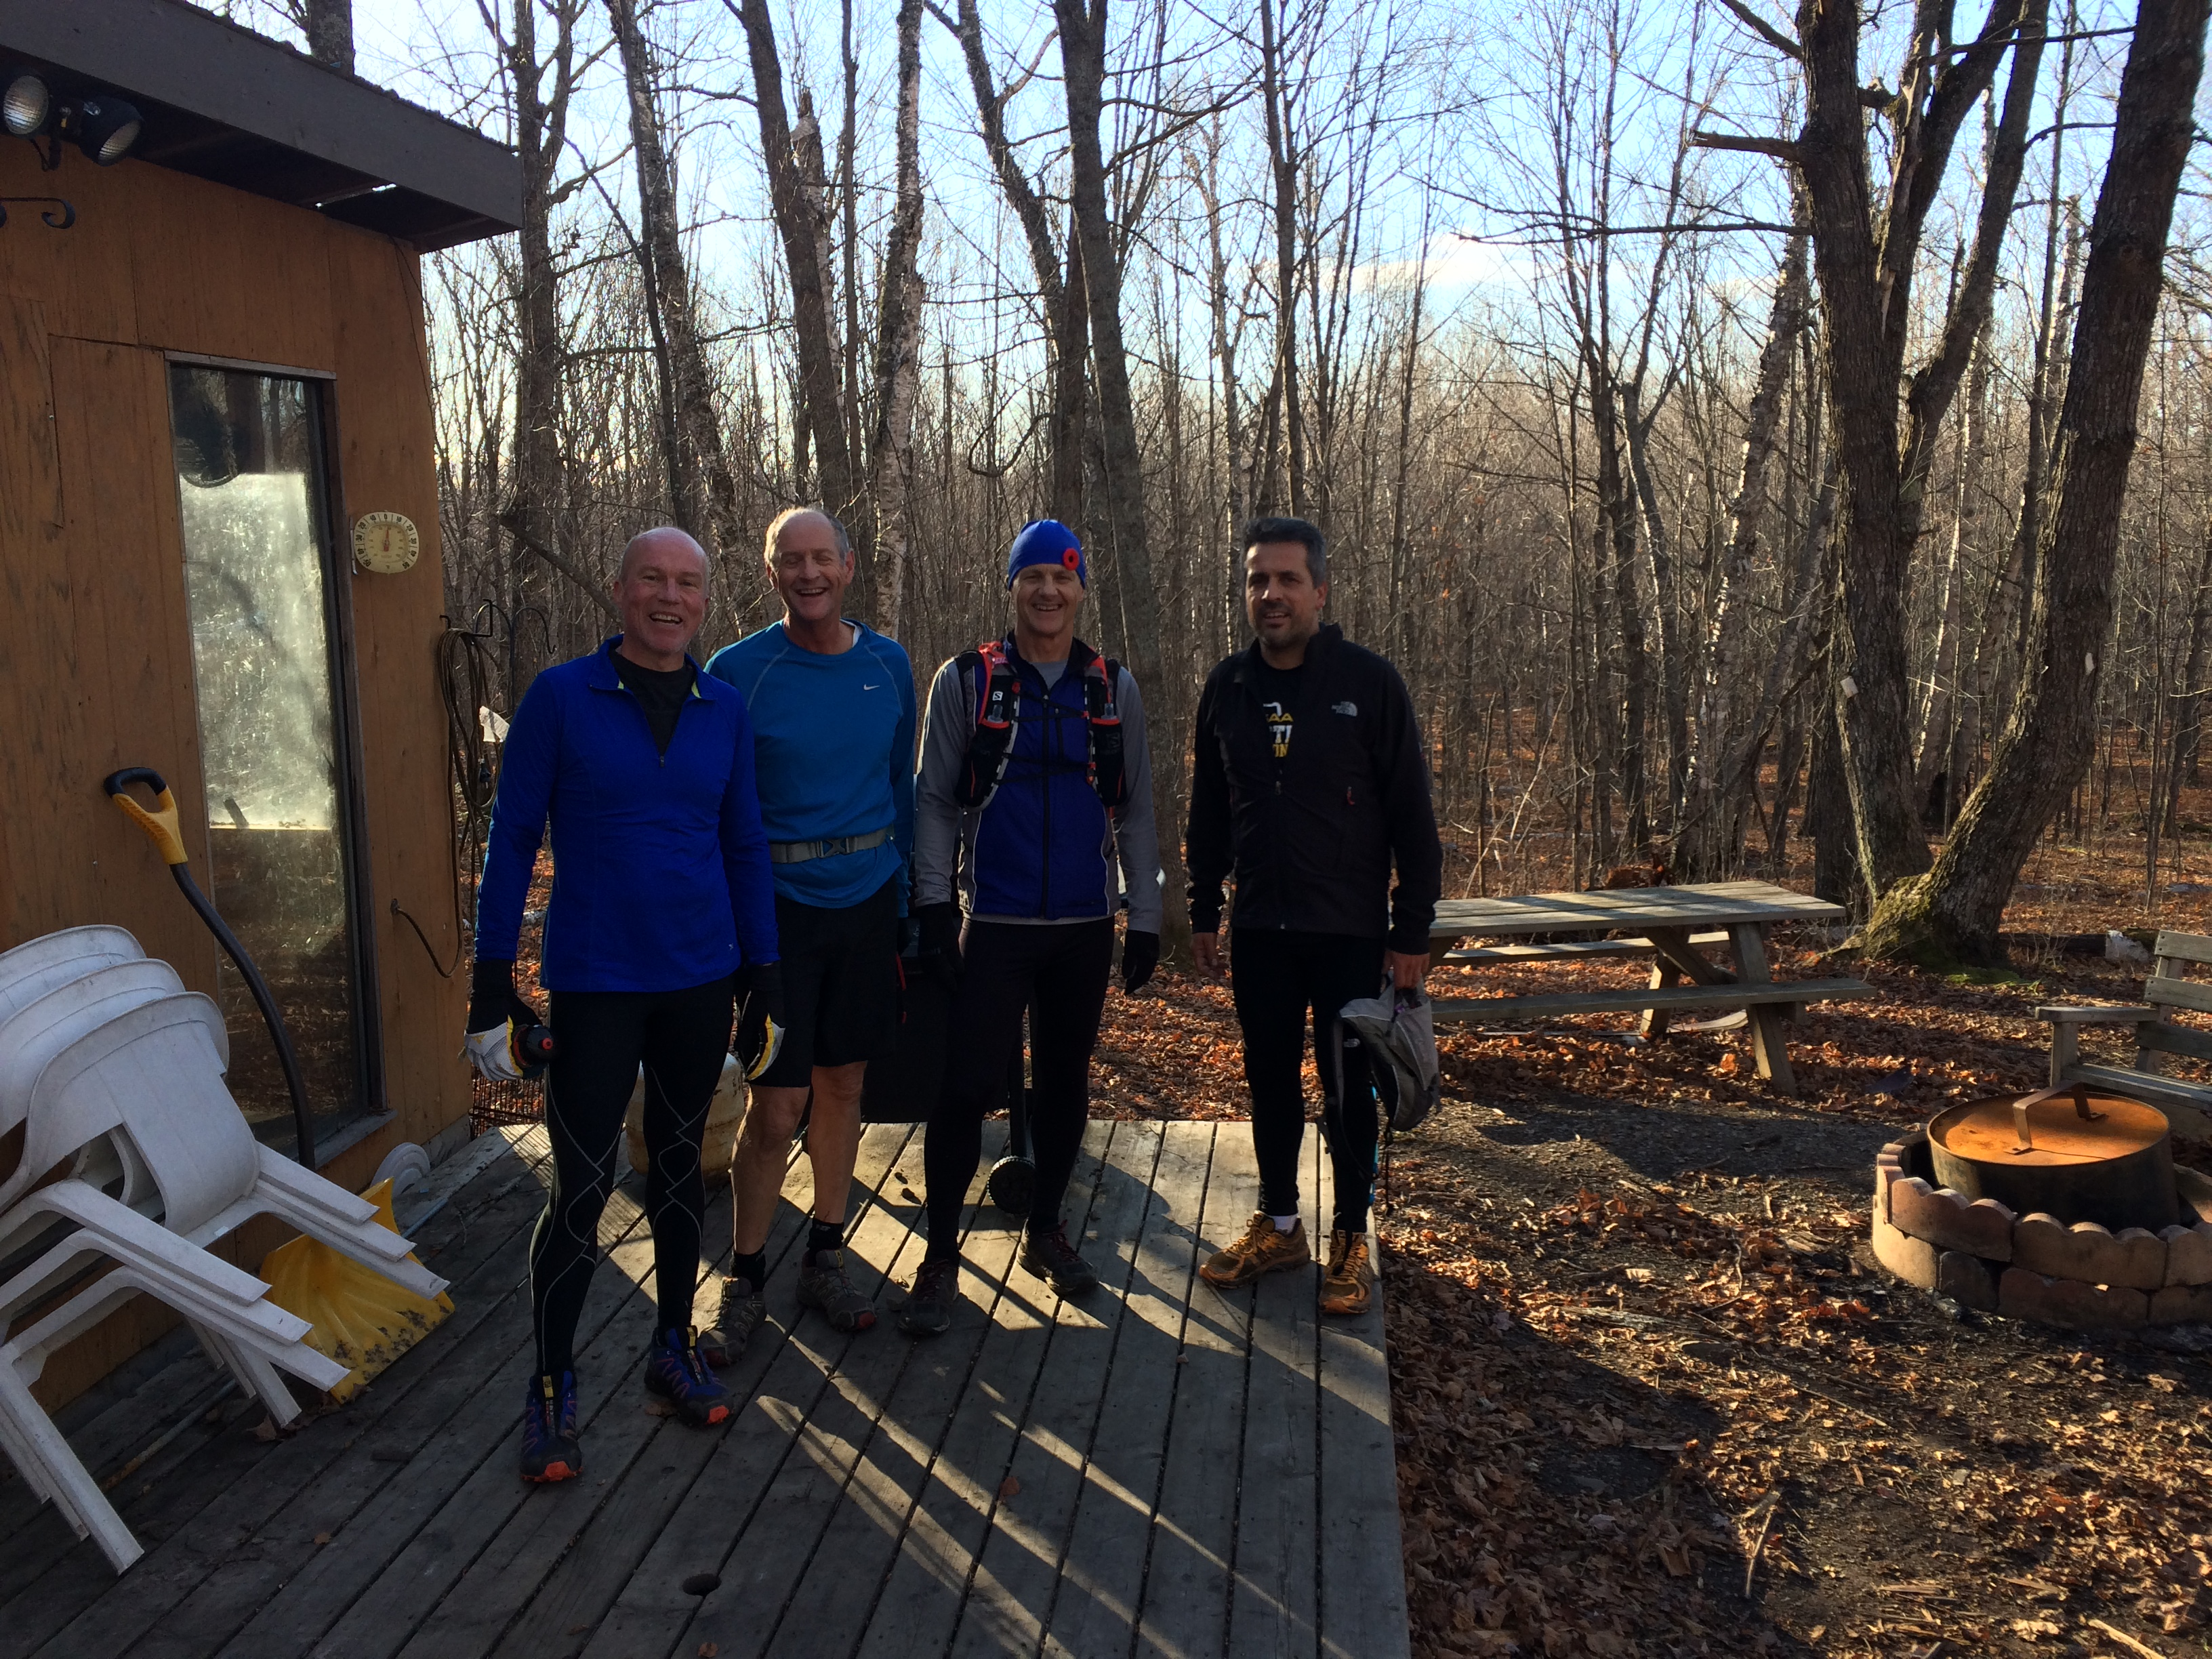 Mike, Bob, Jim, Steve_Novemberance Day Trail run_2016